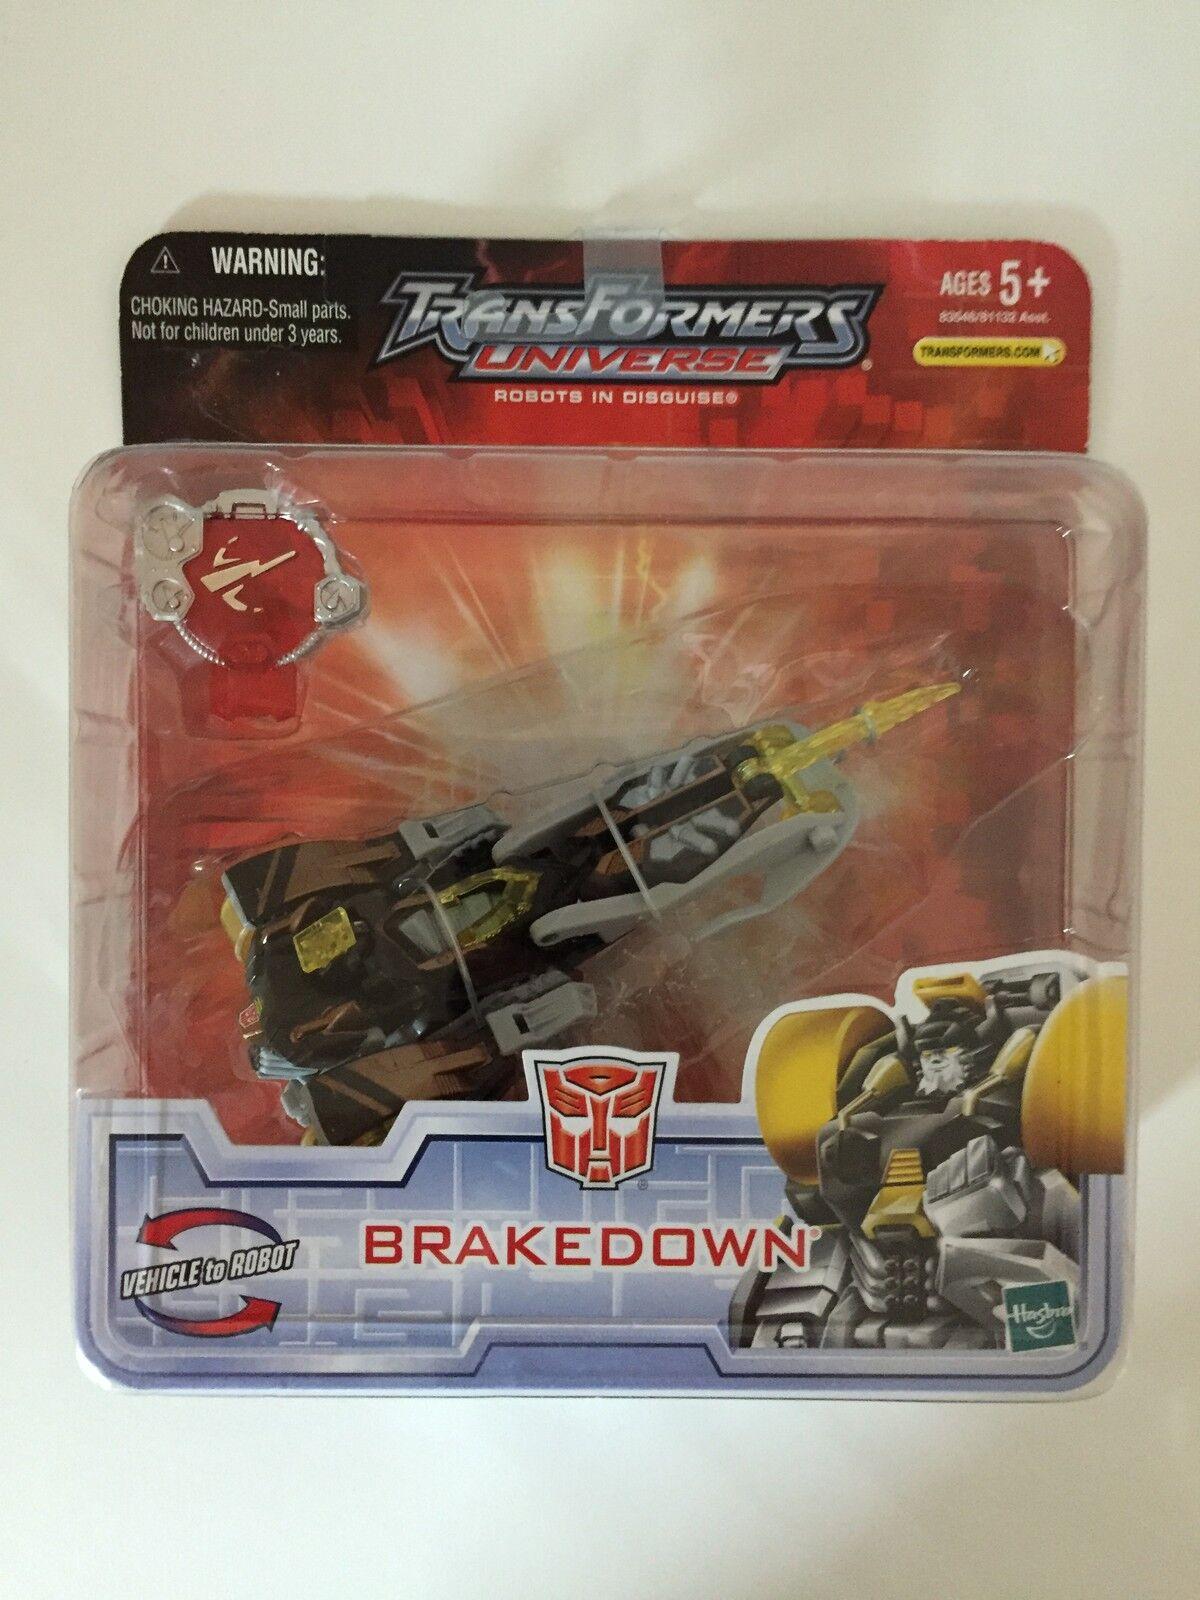 BRAKEDOWN Hasbro action figure TRANSFORMERS UNIVERSE Hasbro BRAKEDOWN 2007 83f9ae